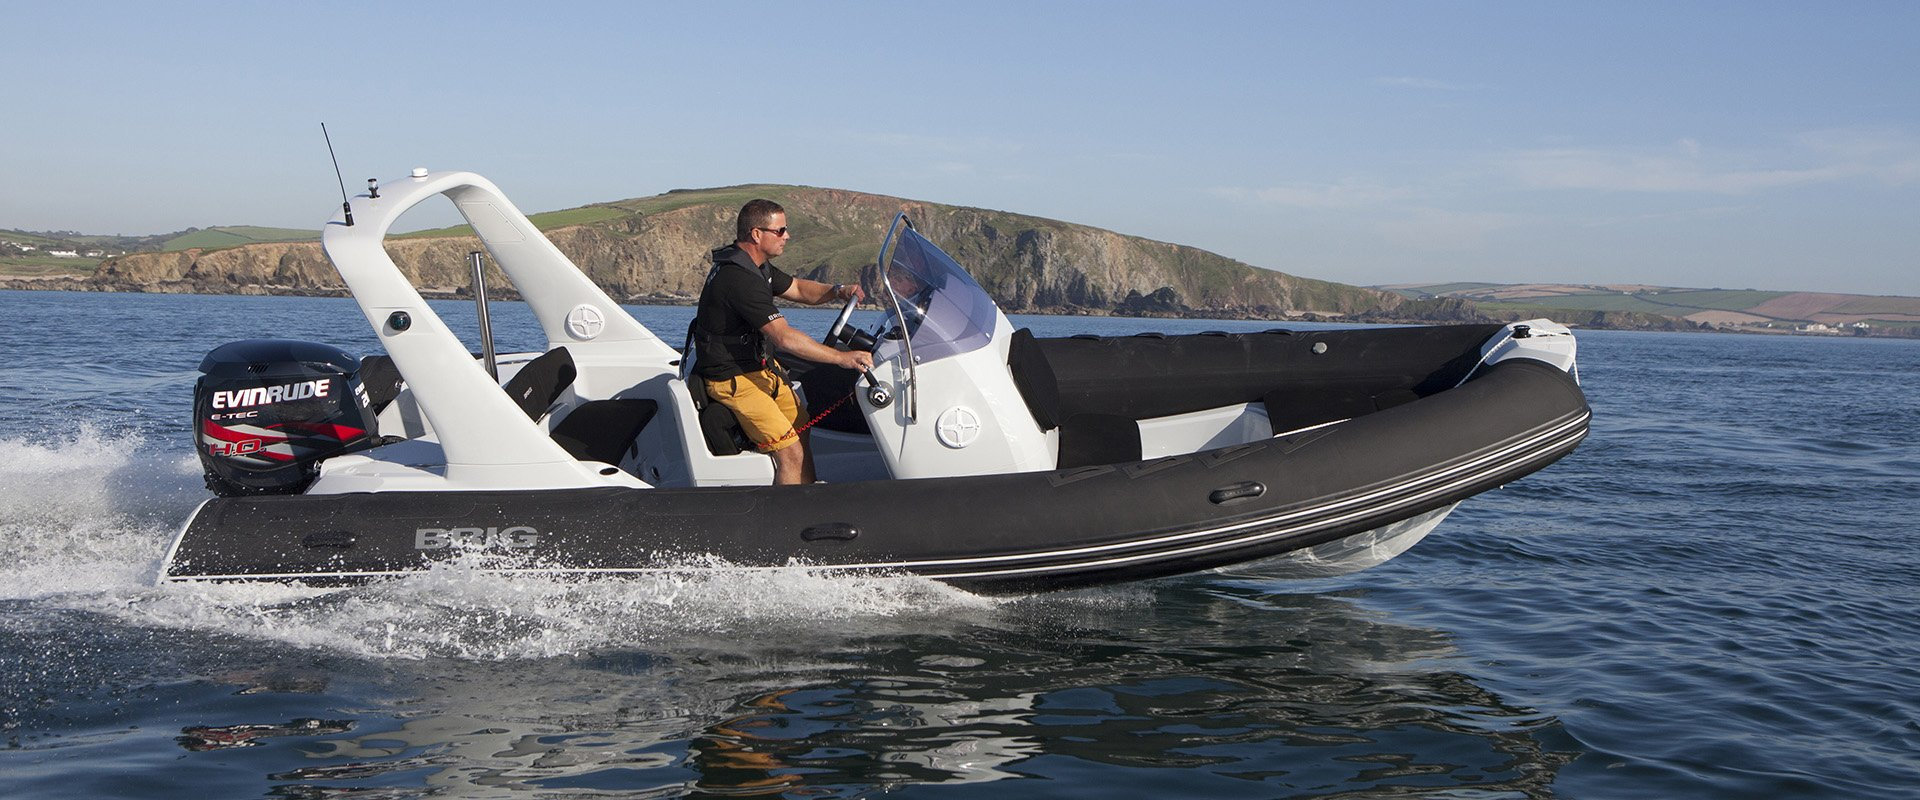 Eagle 650 Inflatable RIB